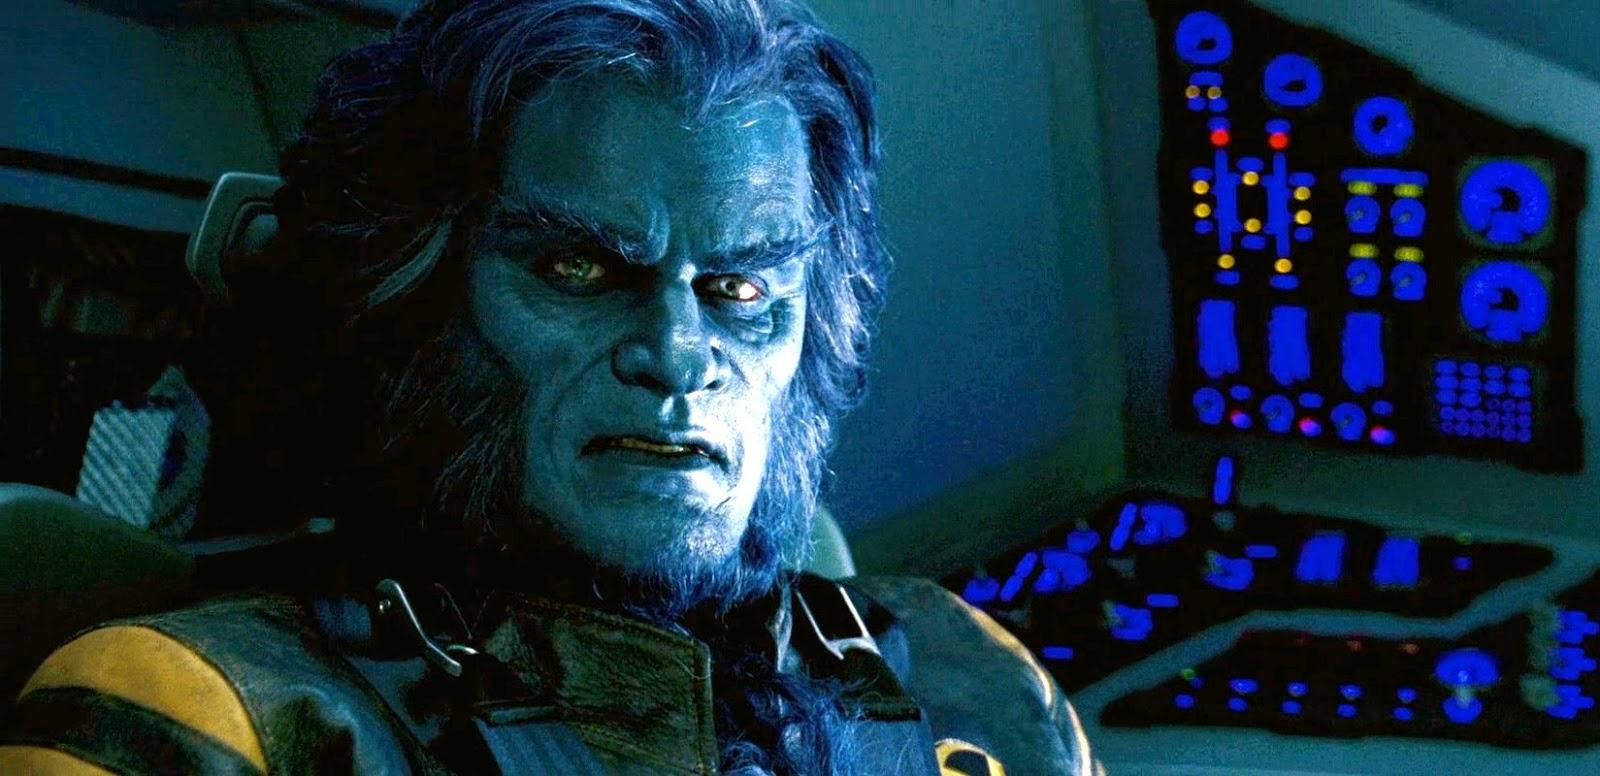 Kelsey Grammer quer reprisar seu papel em X-Men: Apocalipse